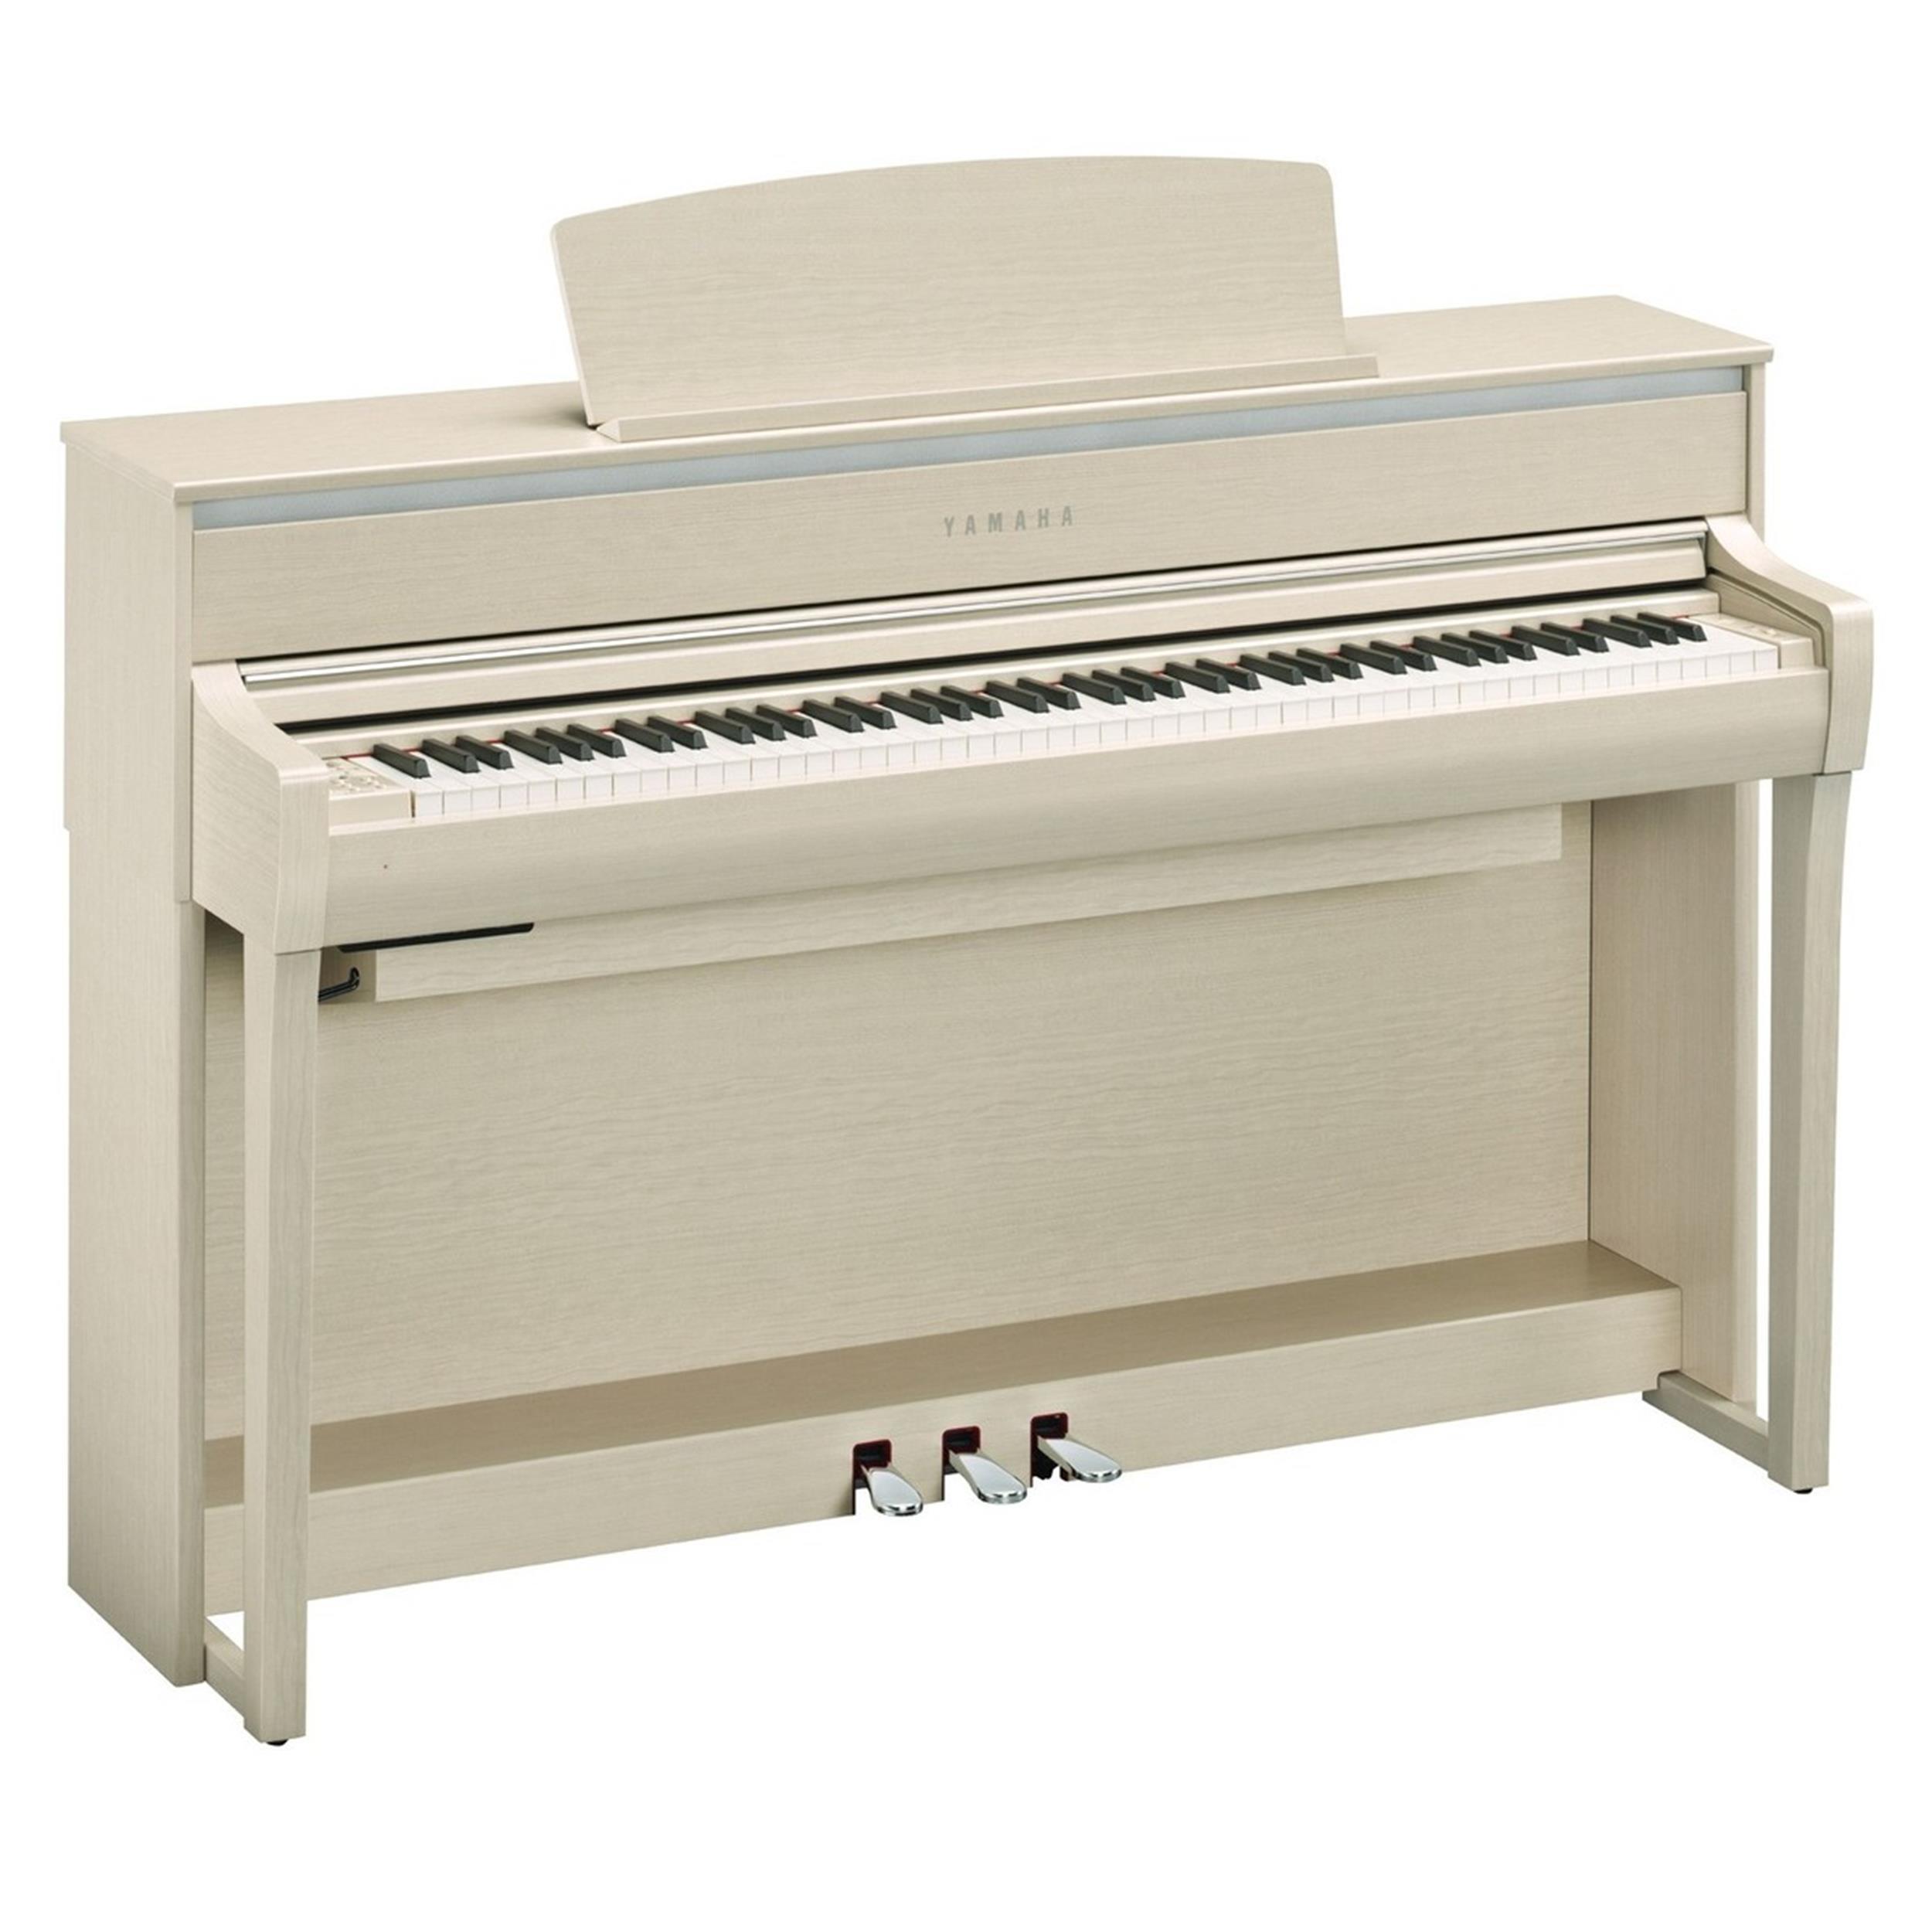 YAMAHA CLP675WAIT - CLAVINOVA - DIGITAL PIANO OM IT